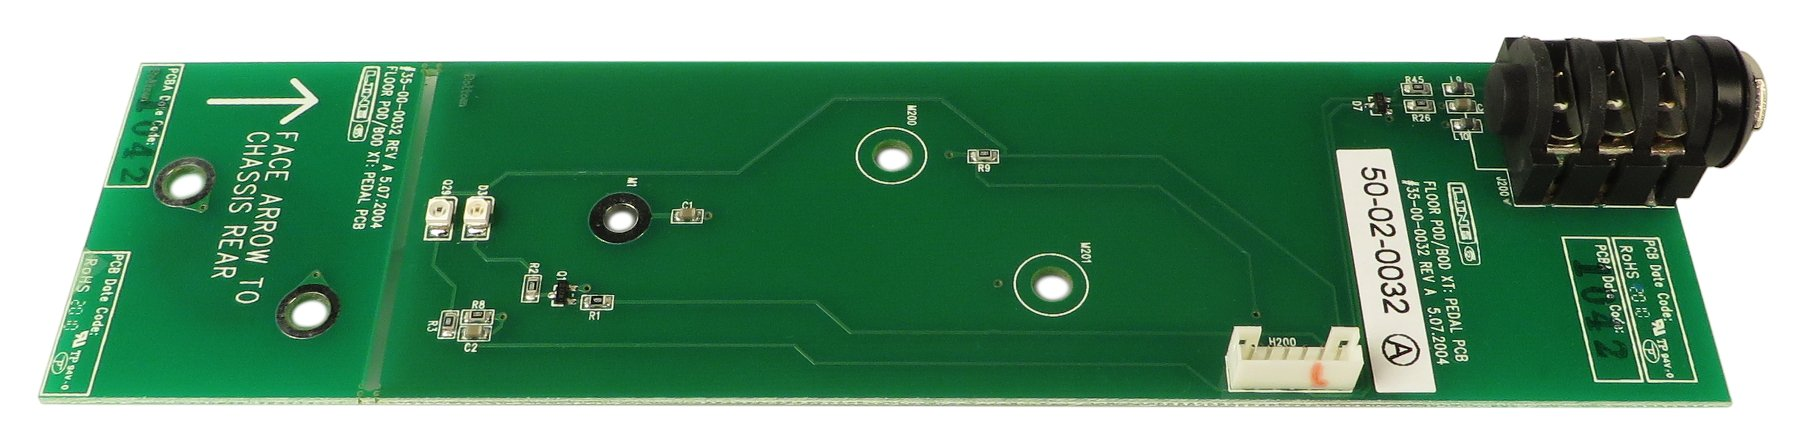 Line 6 50-02-0032 Line 6 POD Pedal PCB Assembly 50-02-0032